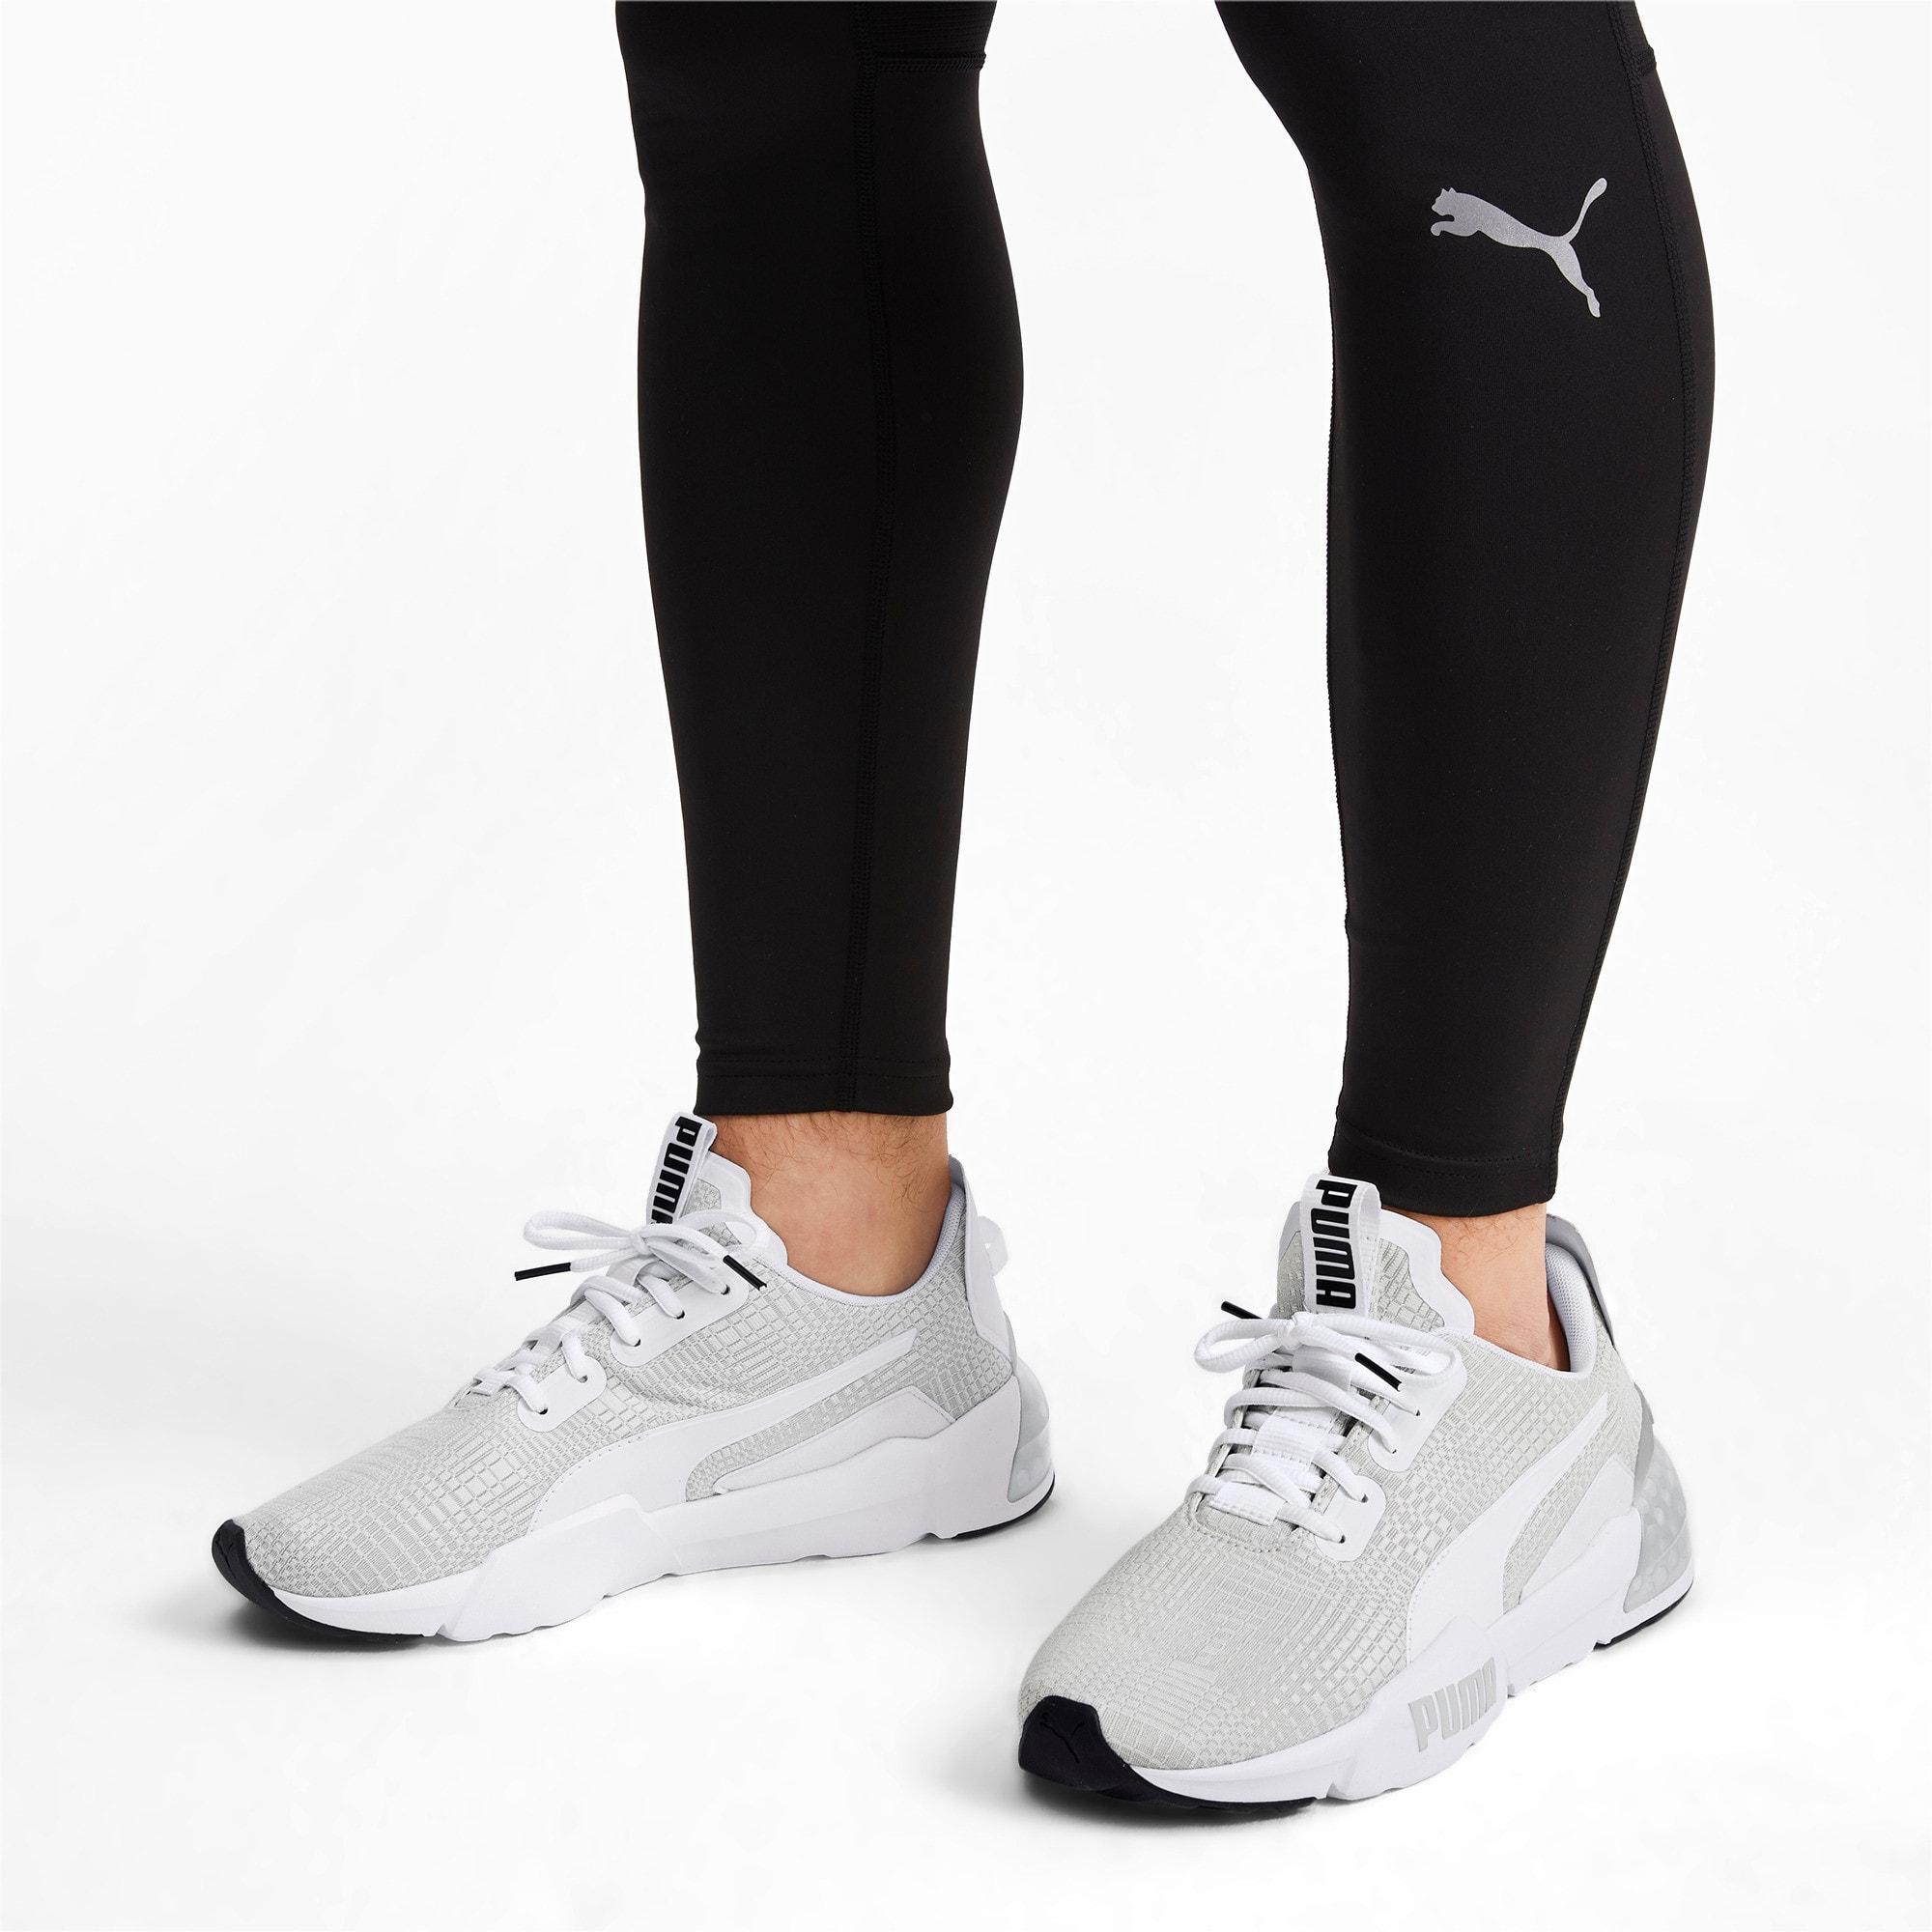 Thumbnail 2 of CELL Phase Lights Men's Running Shoes, Puma White-Gray Violet, medium